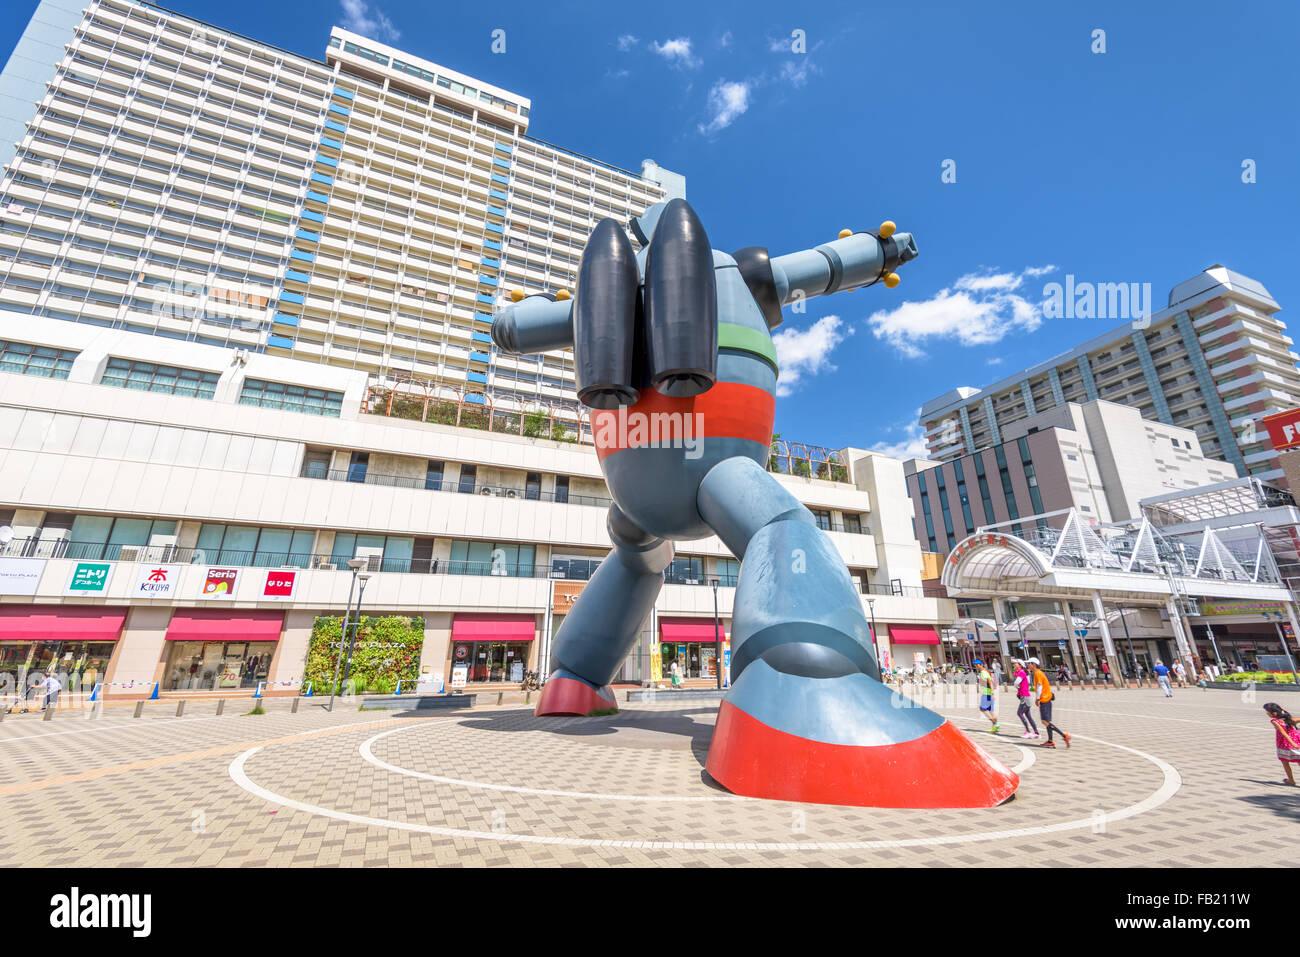 The Gigantor robot monument at Shin-nagata Station in Kobe, Japan. - Stock Image